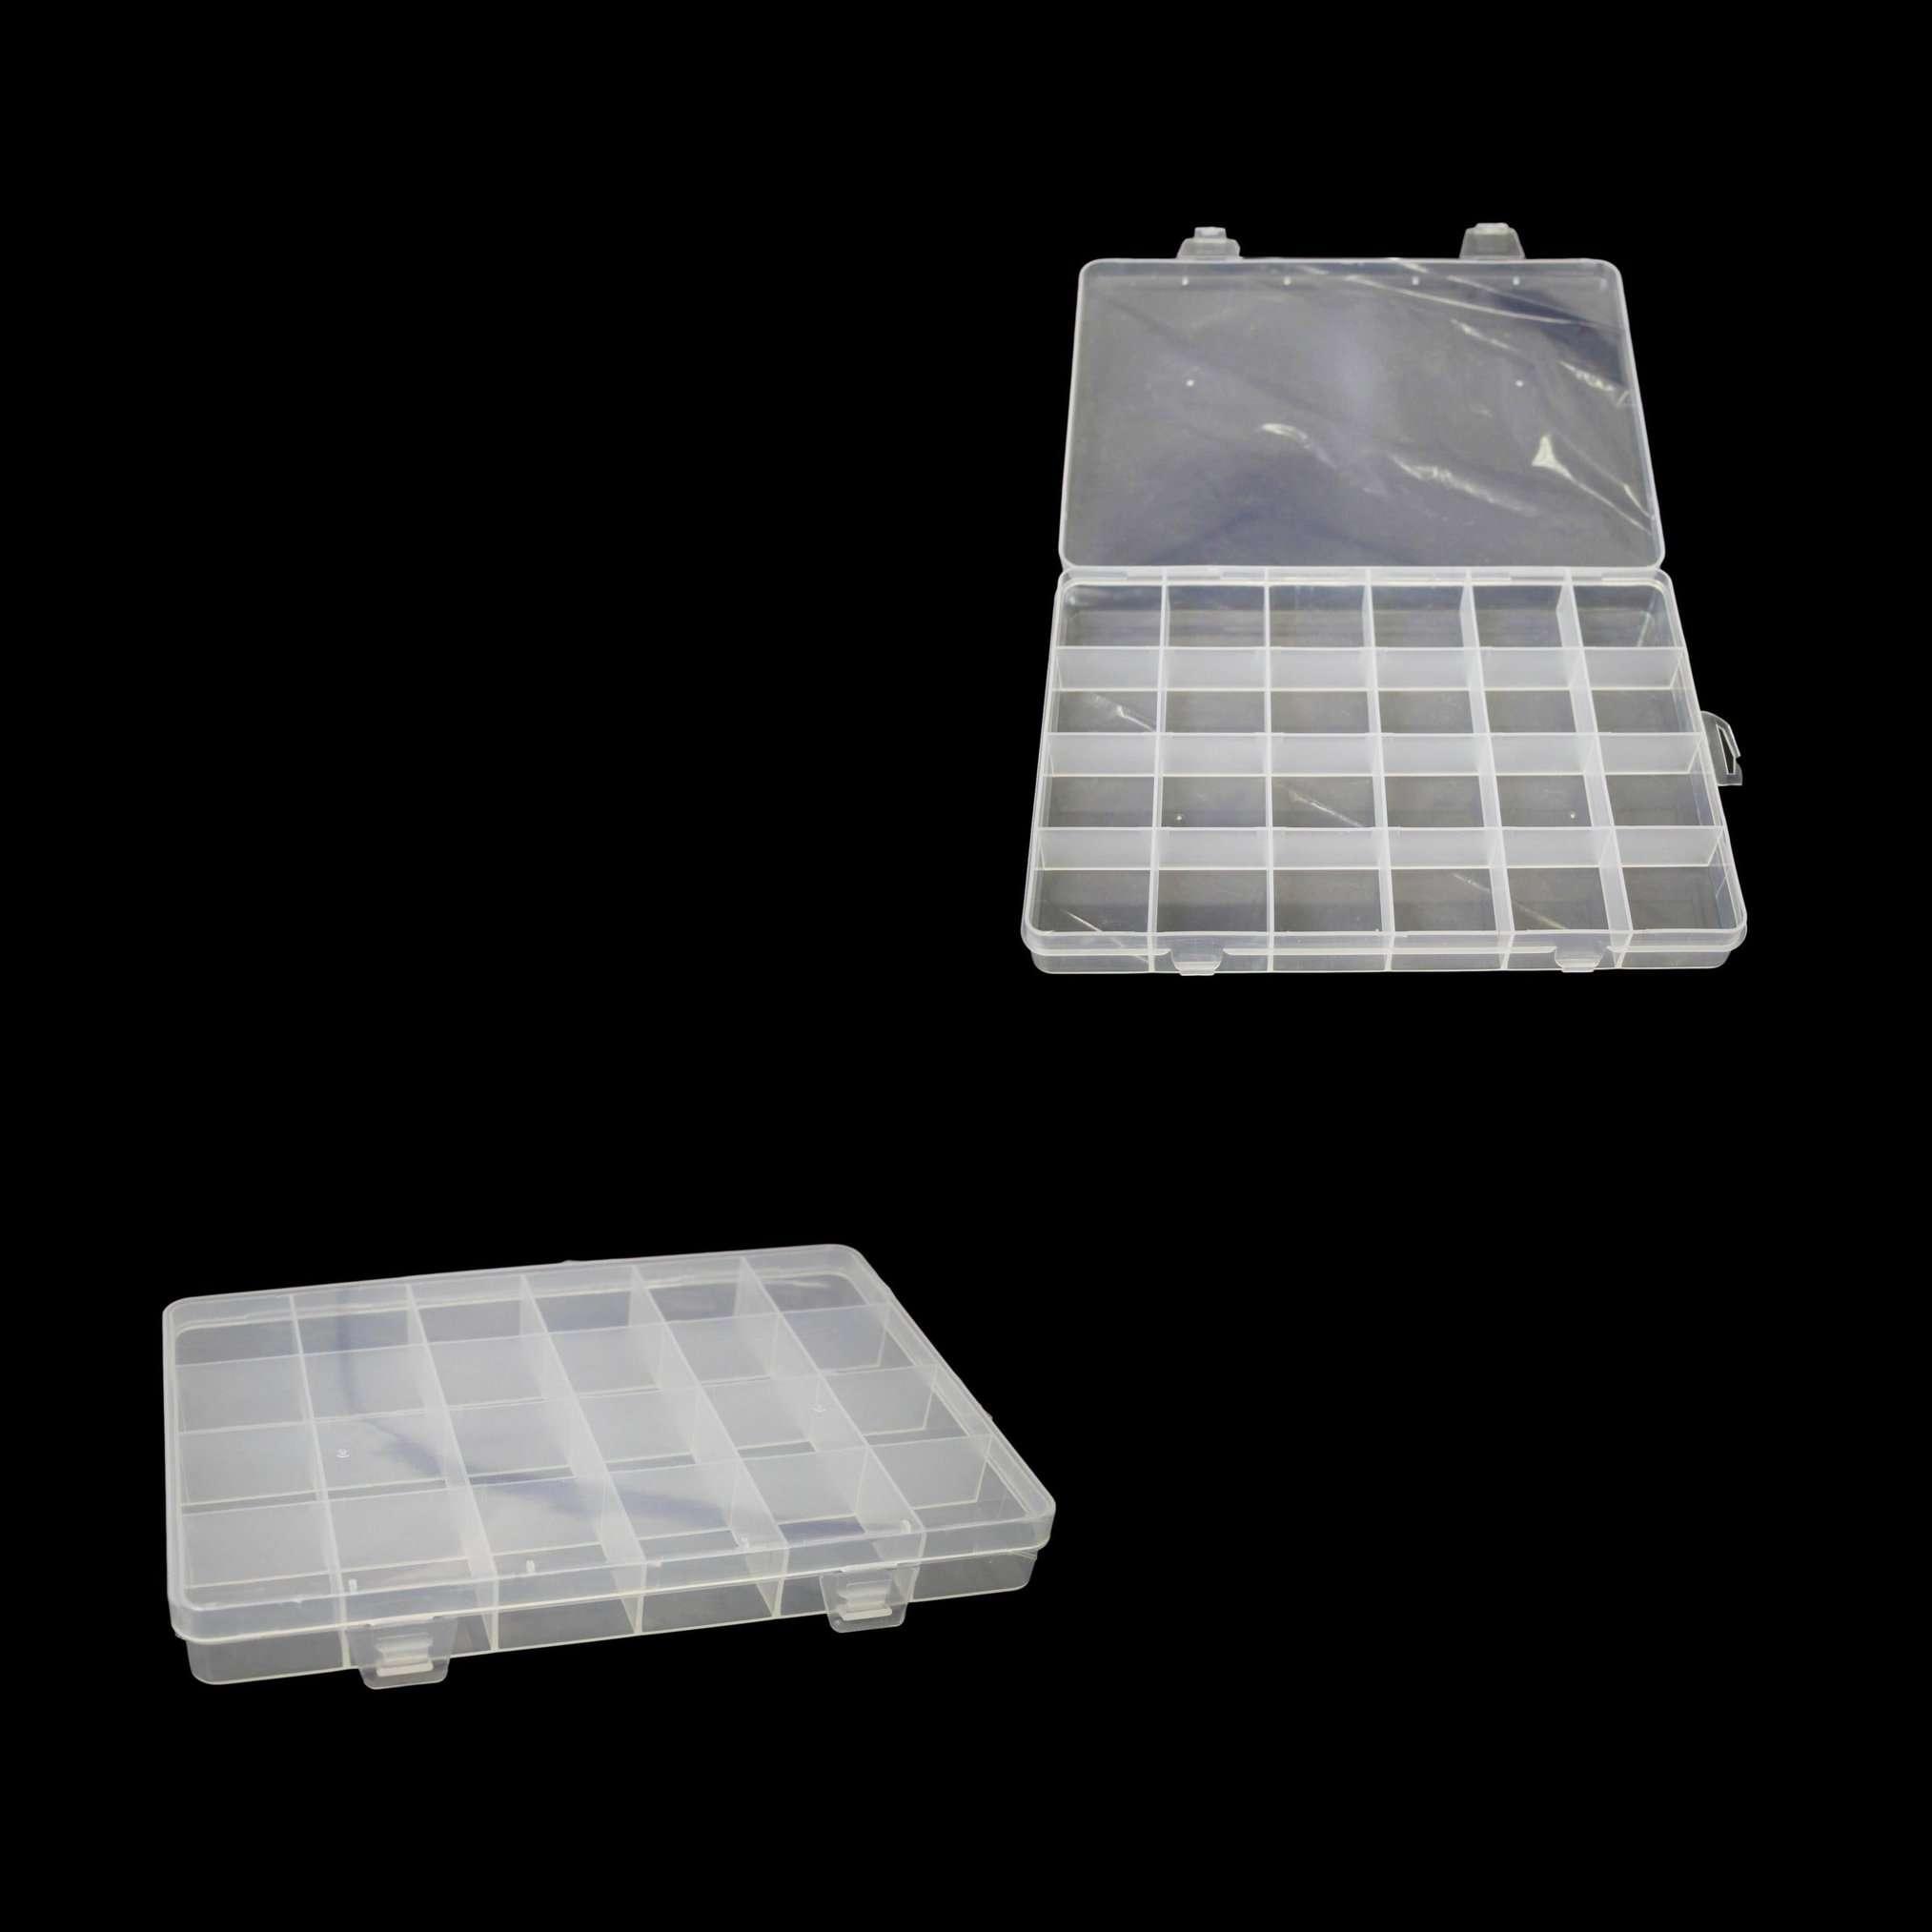 24 Plastic Compartment Box Small Organiser Storage Craft Box 19cm x 13cm 2035 (P